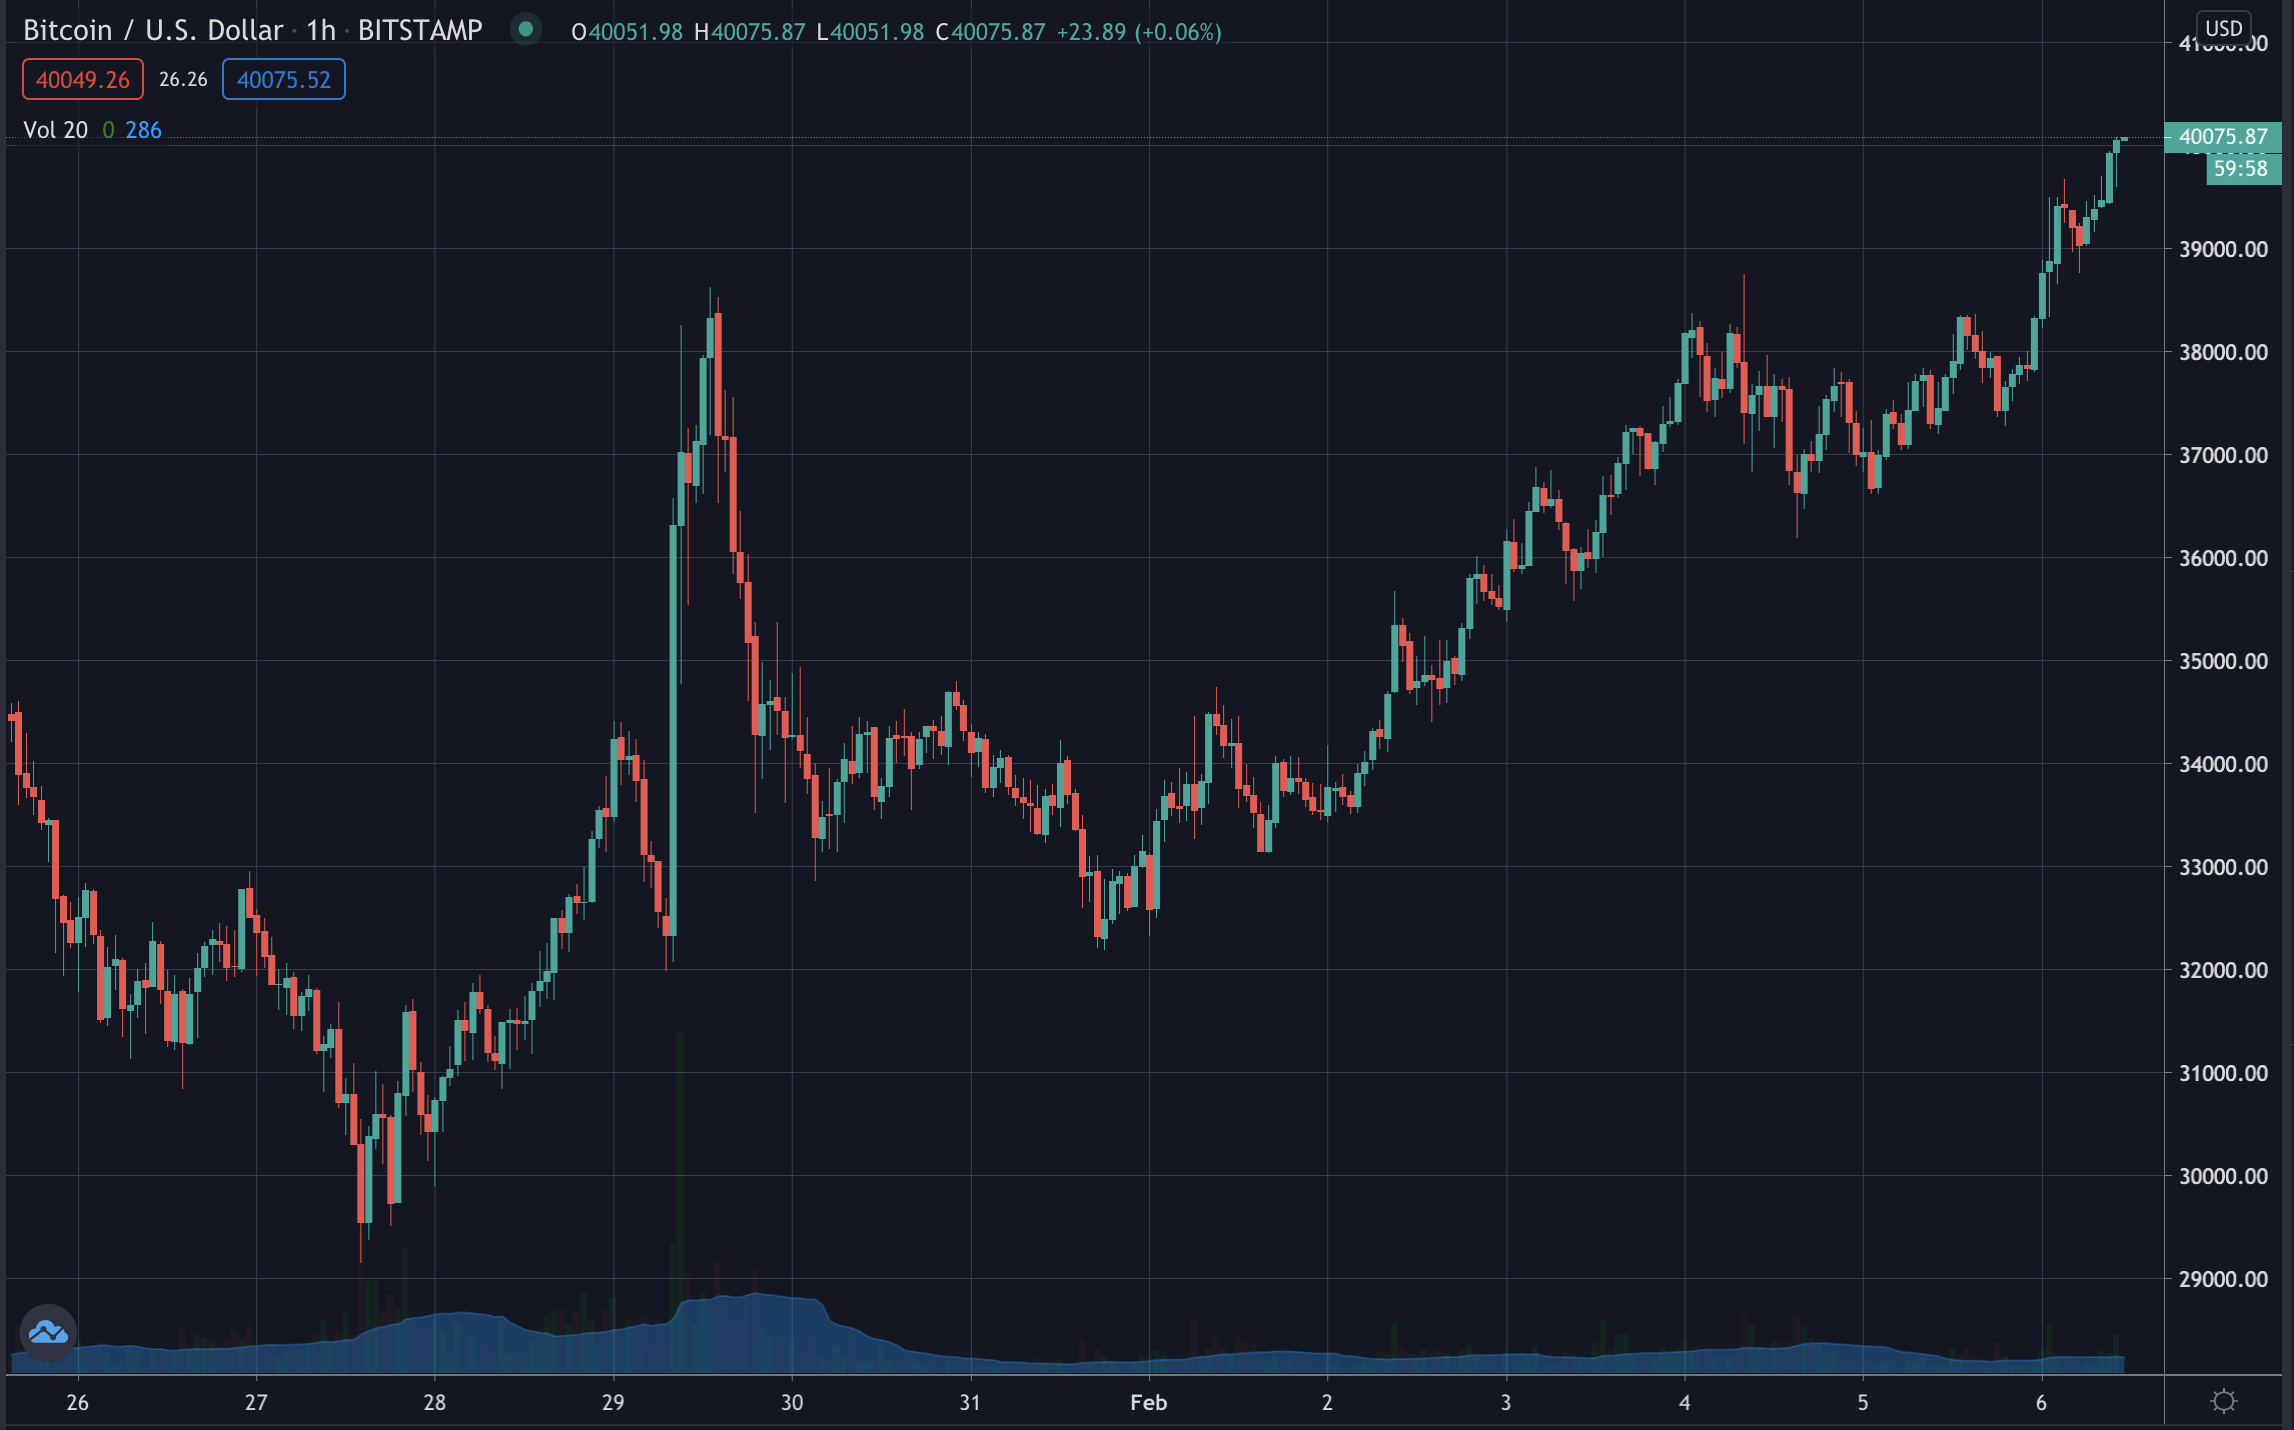 Bitcoin's price, Feb 2021